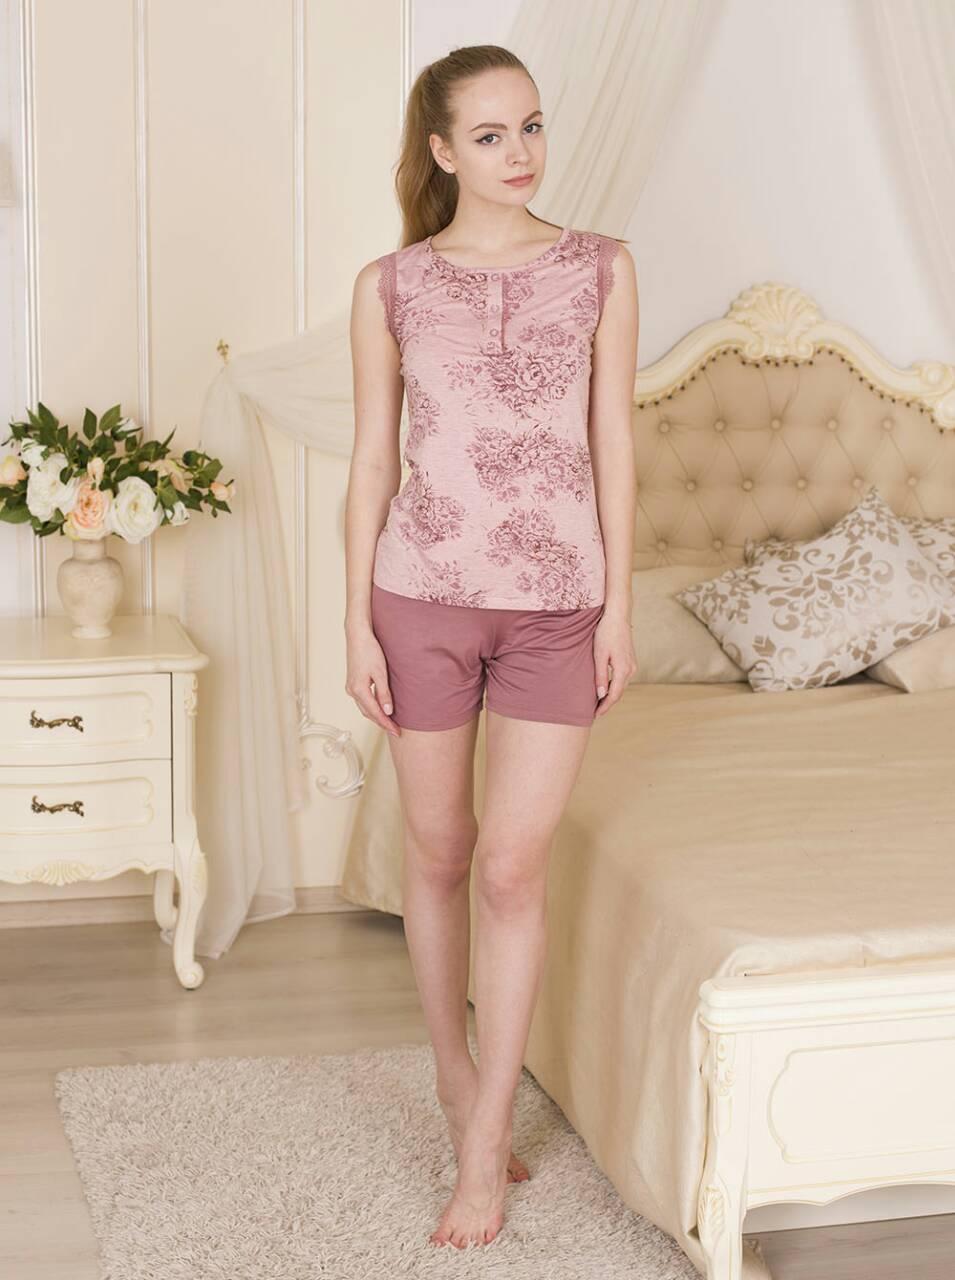 Комплект шорты с майкой ТМ Роксана коллекция Rose размер L